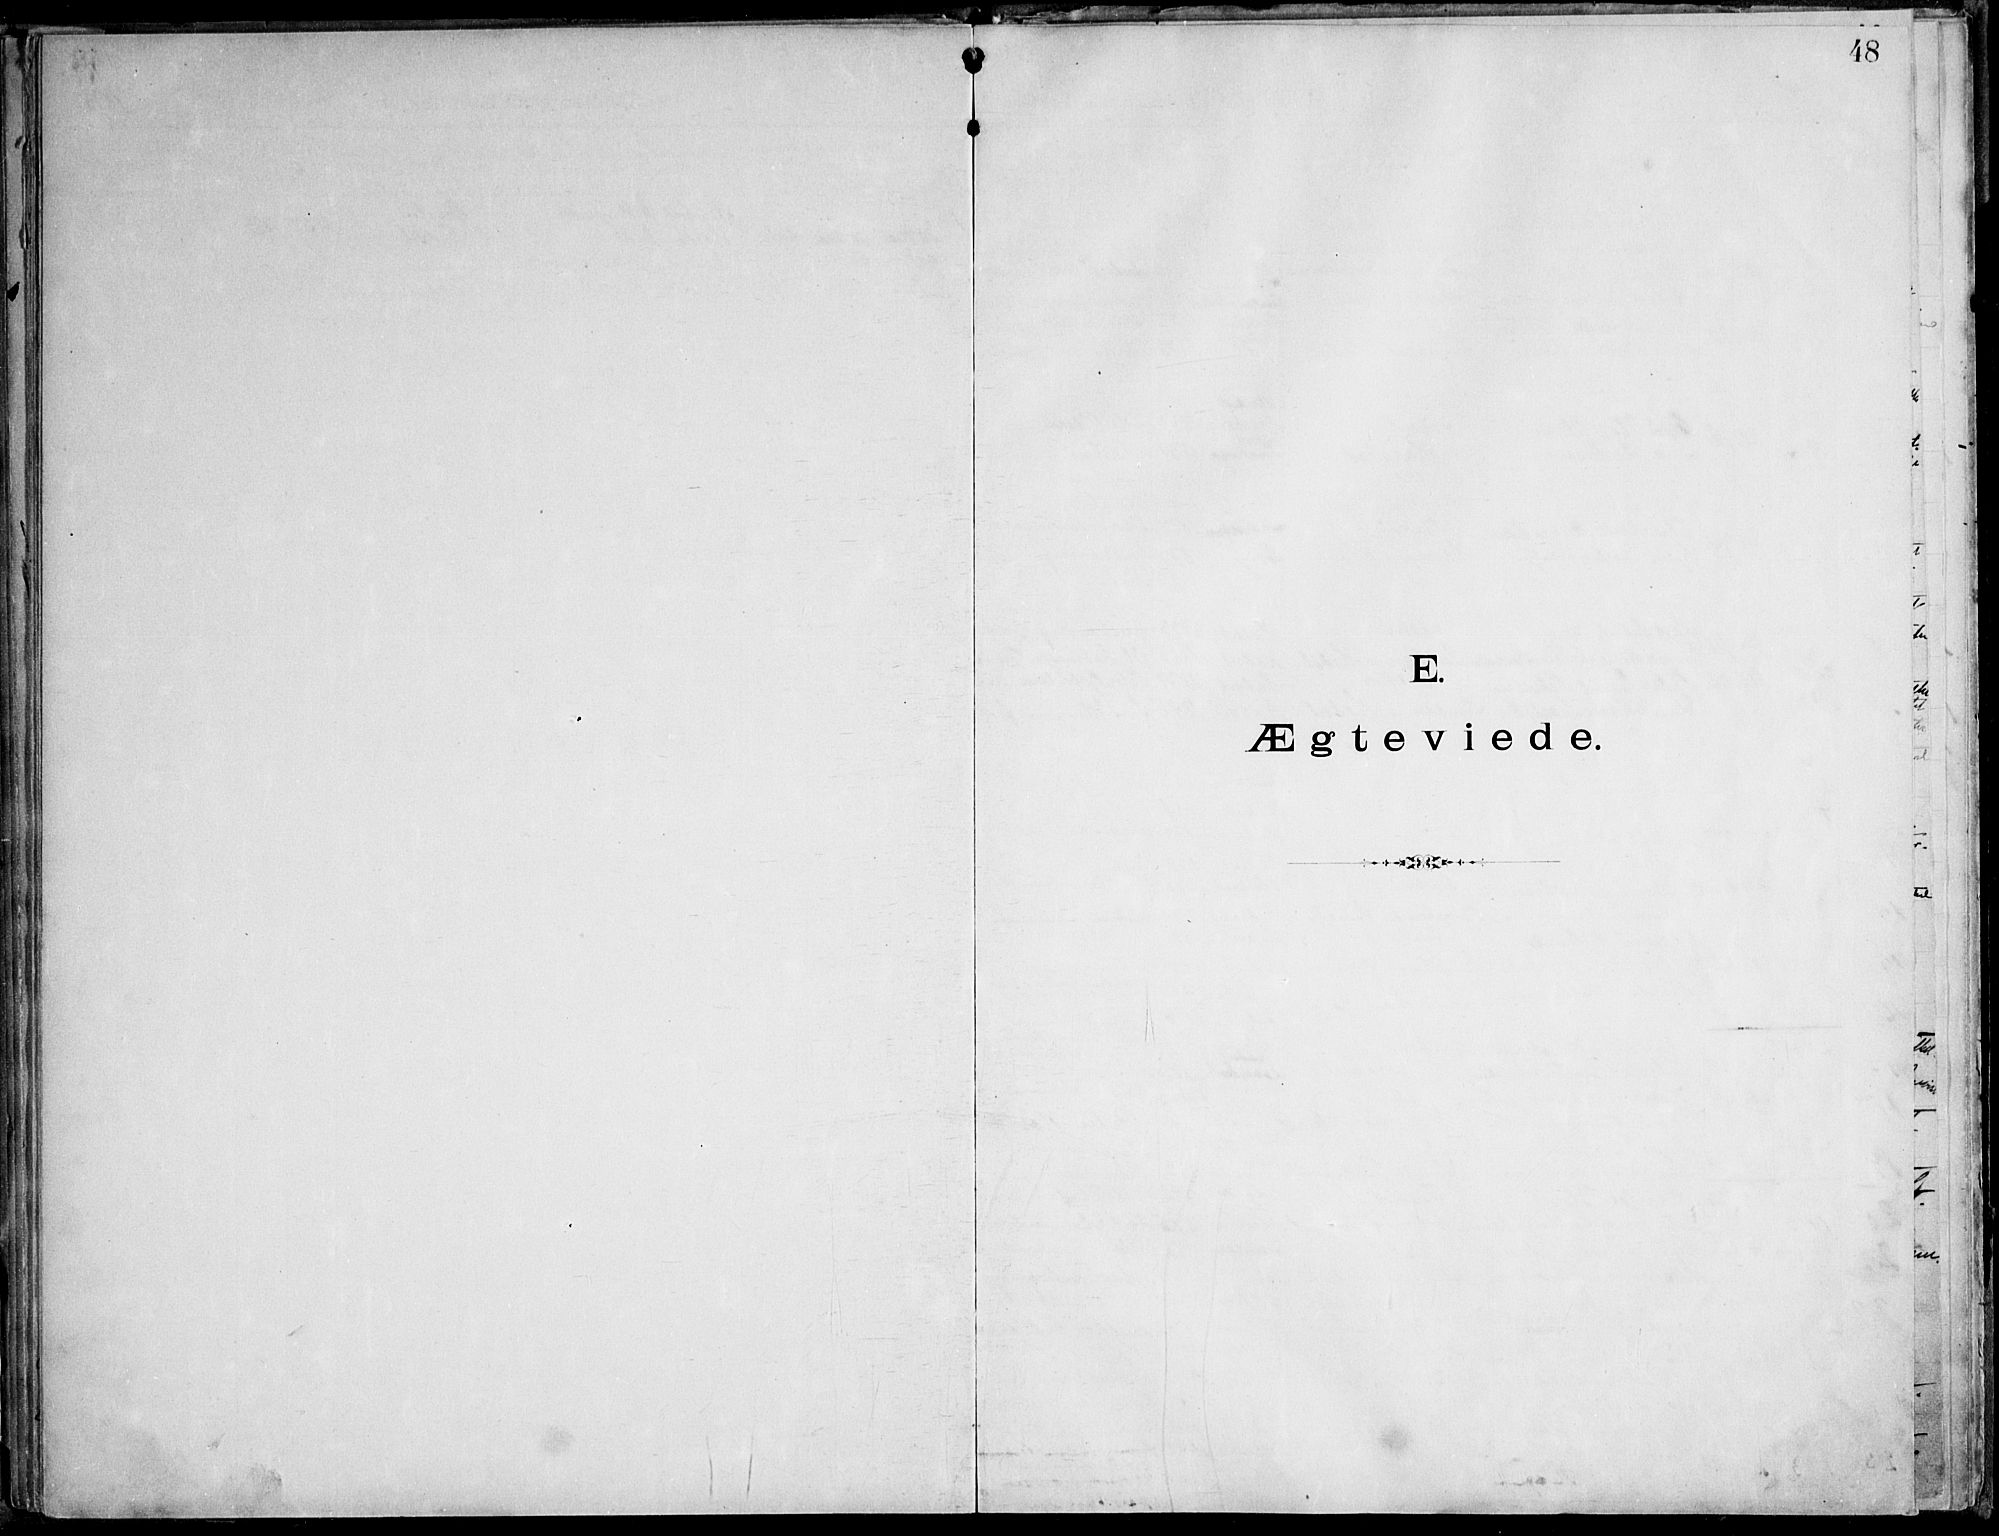 SAT, Ministerialprotokoller, klokkerbøker og fødselsregistre - Nordland, 888/L1276: Dissenter register no. 888D03, 1893-1944, p. 48